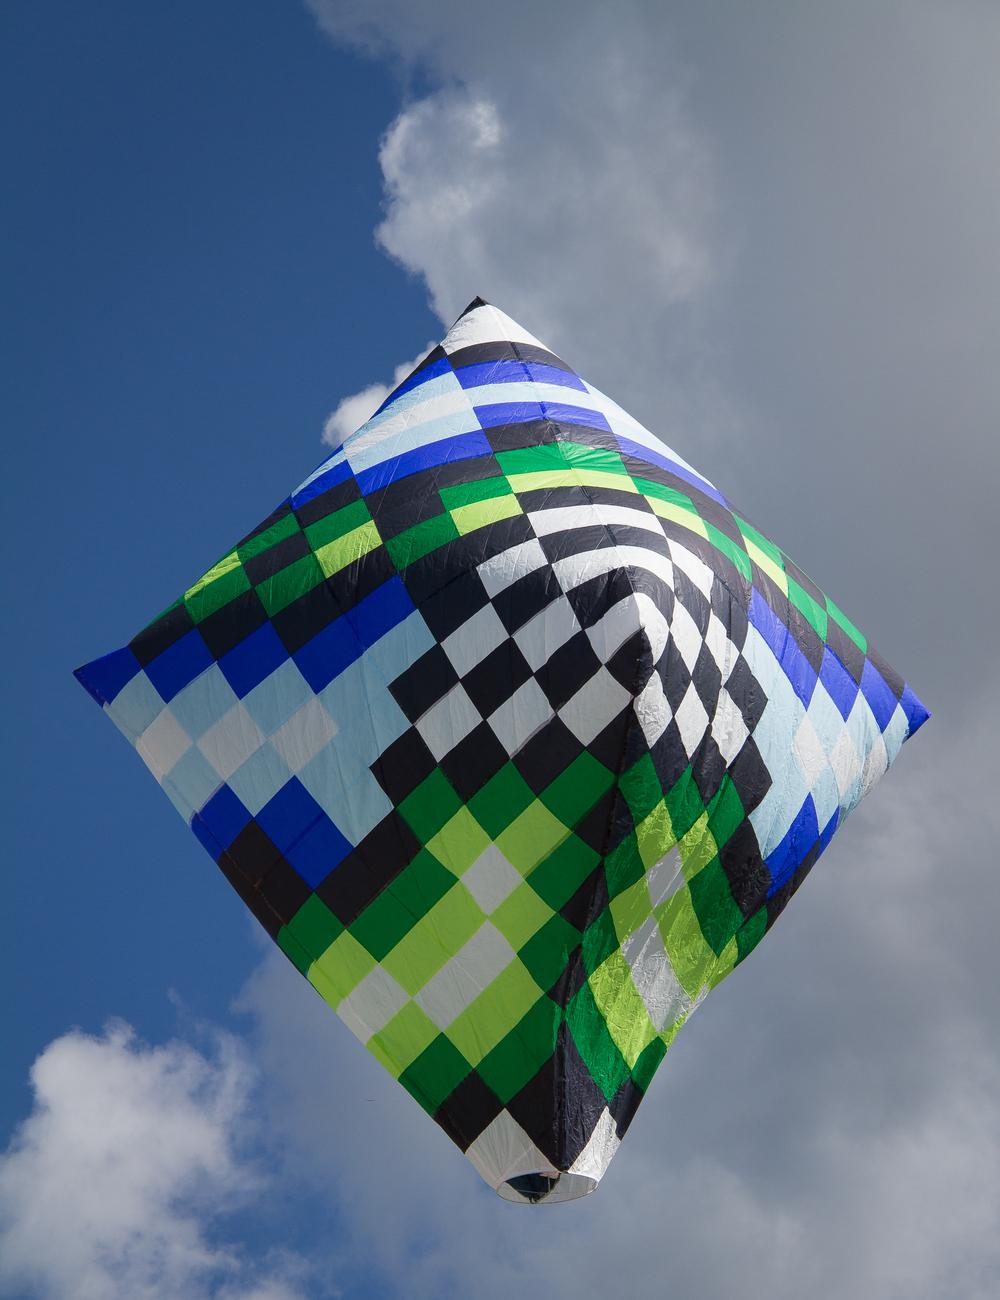 Checkerboard   CantoyaFest: Paracho, Michoacán, Mexico — Saturday, July 19, 2014